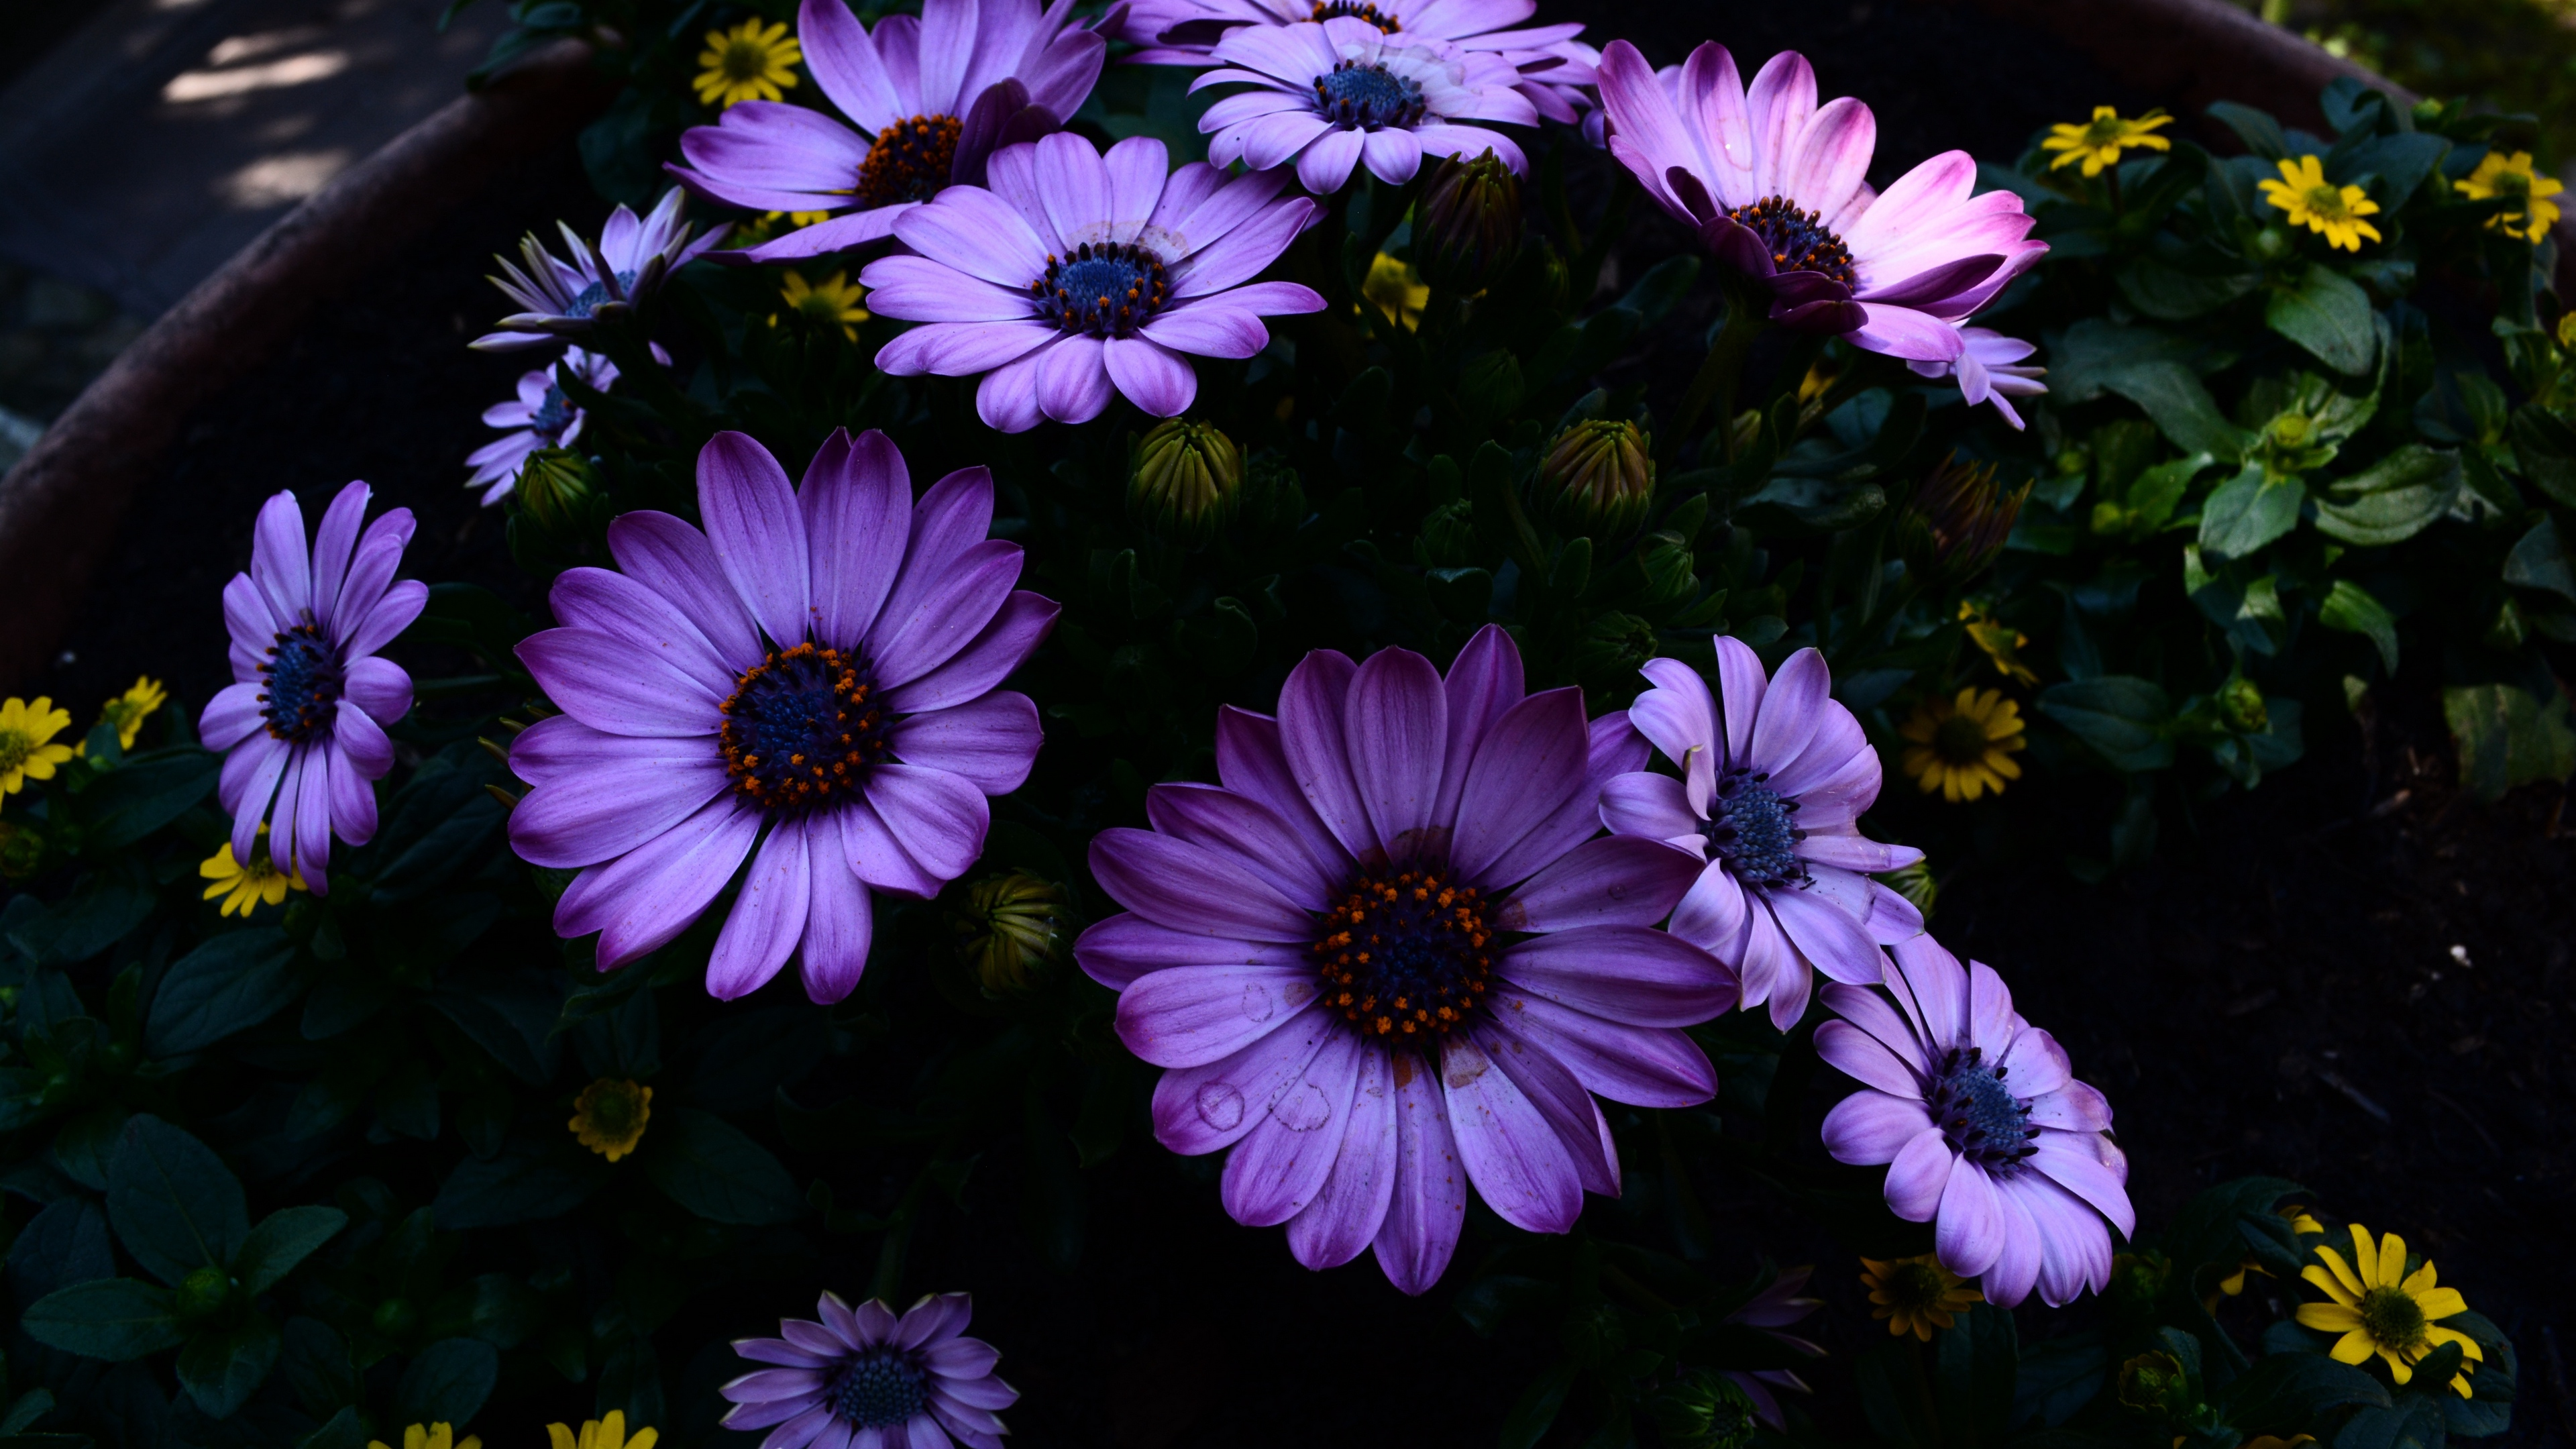 osteospermum flowerbed blooming 4k 1540064967 - osteospermum, flowerbed, blooming 4k - osteospermum, flowerbed, blooming